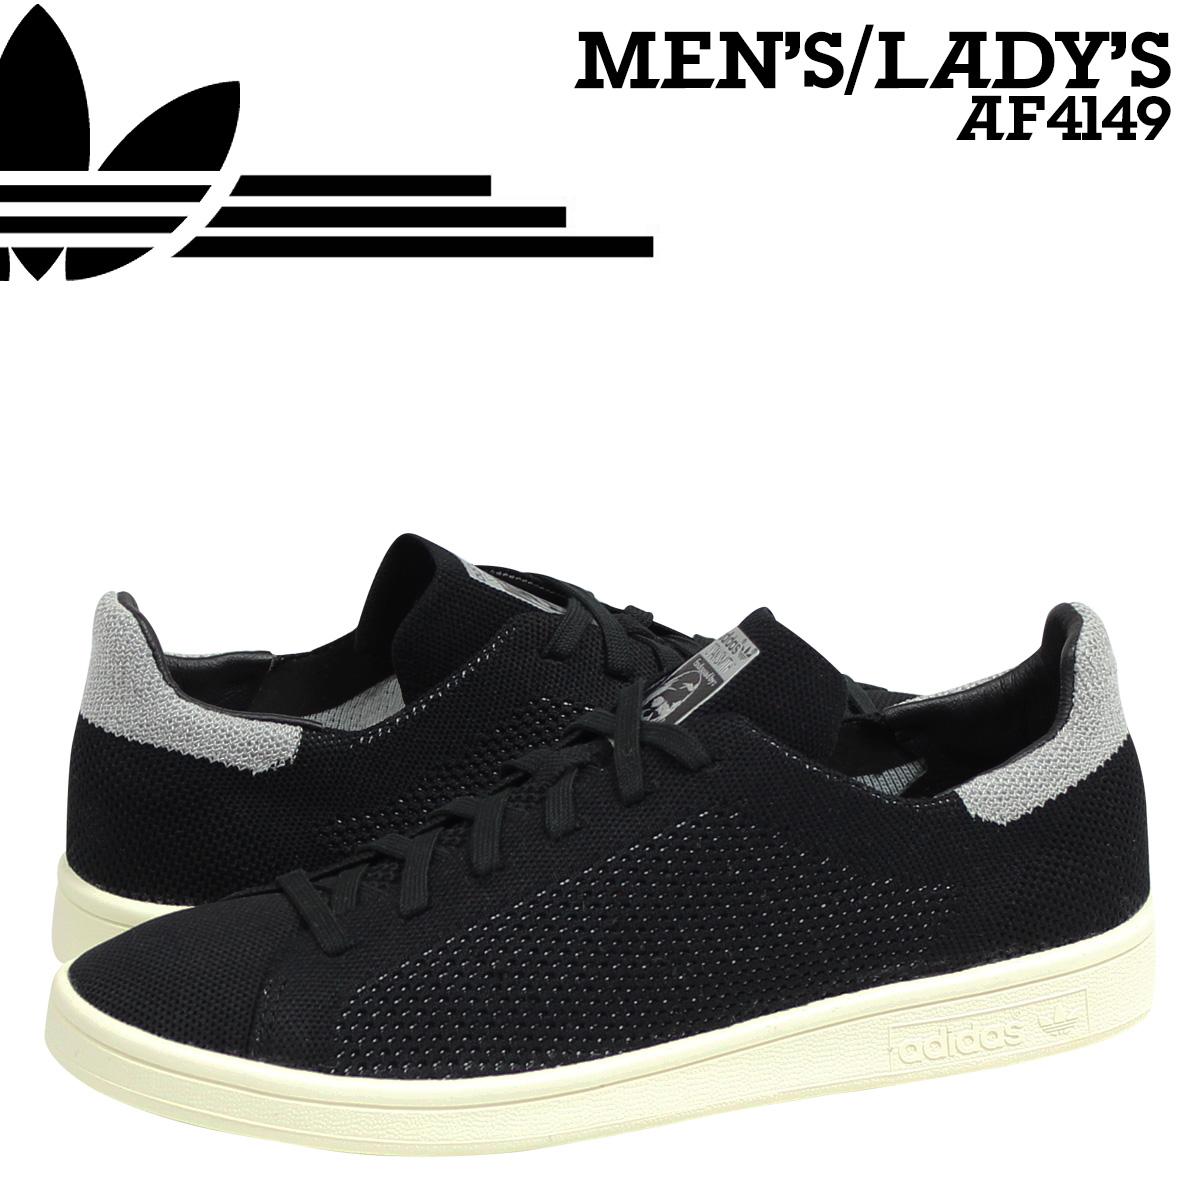 adidas Originals Adidas originals Stan Smith sneakers STAN SMITH PK REFLECTIVE CONSORTIUM AF4149 men gap Dis shoes black black